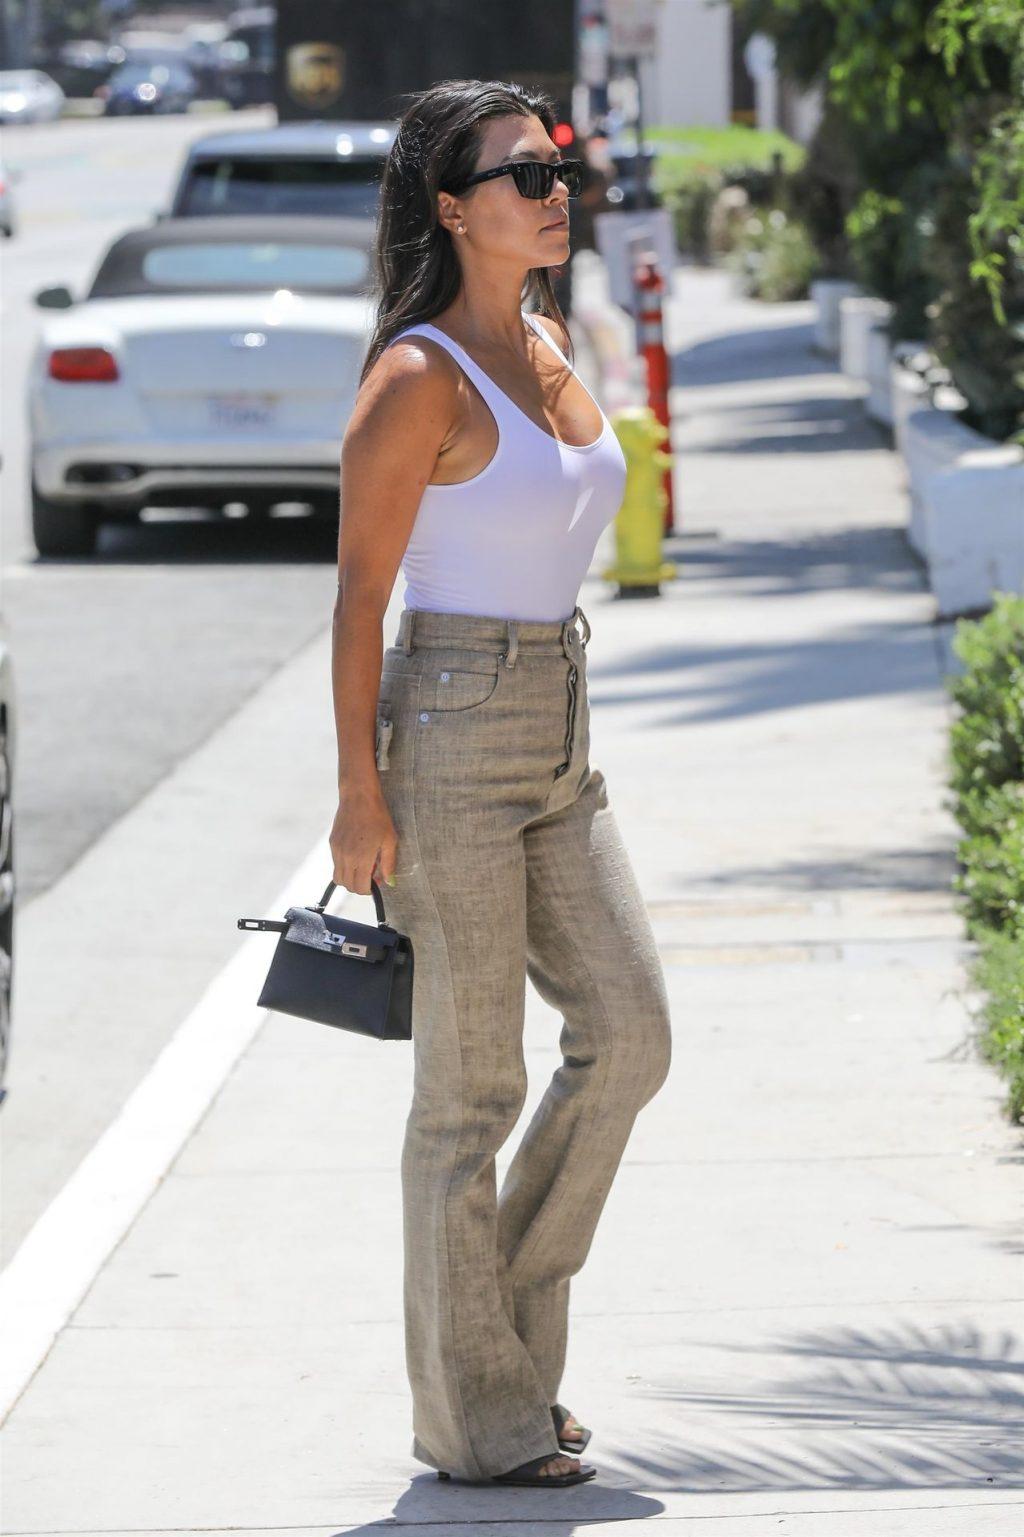 Kourtney Kardashian See Through Thefappeningblog Com 21 1024